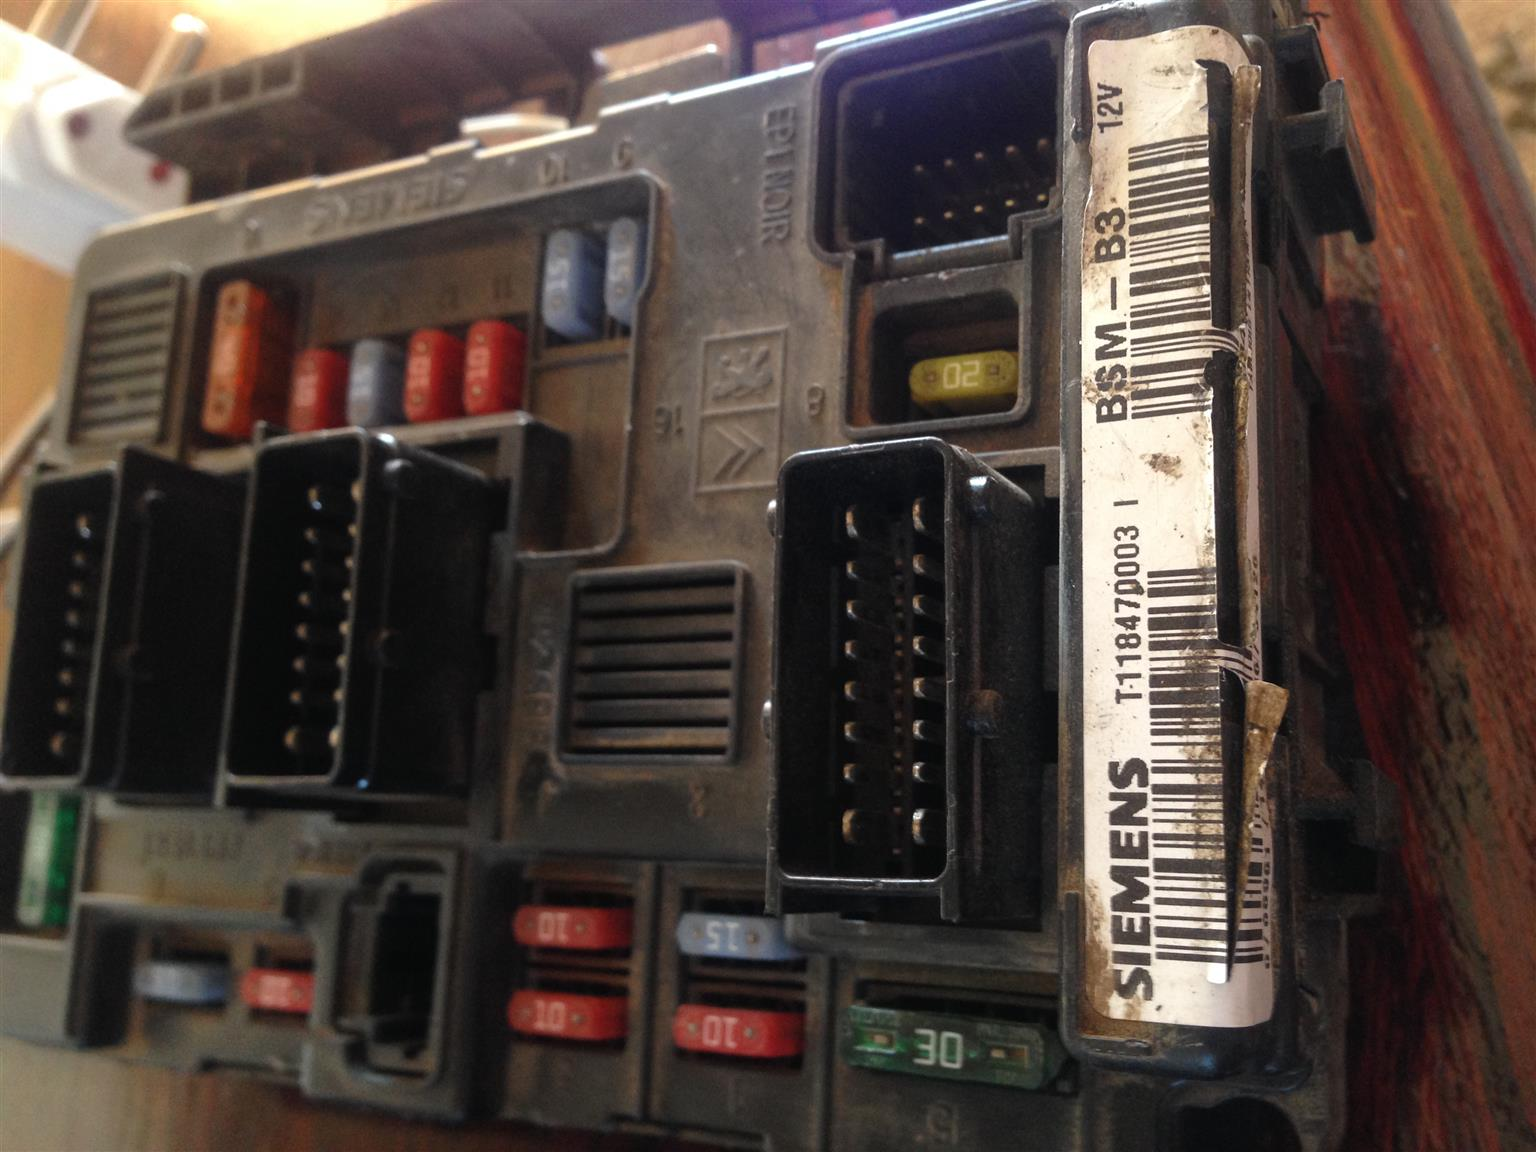 peugeot 206 fuse box - main